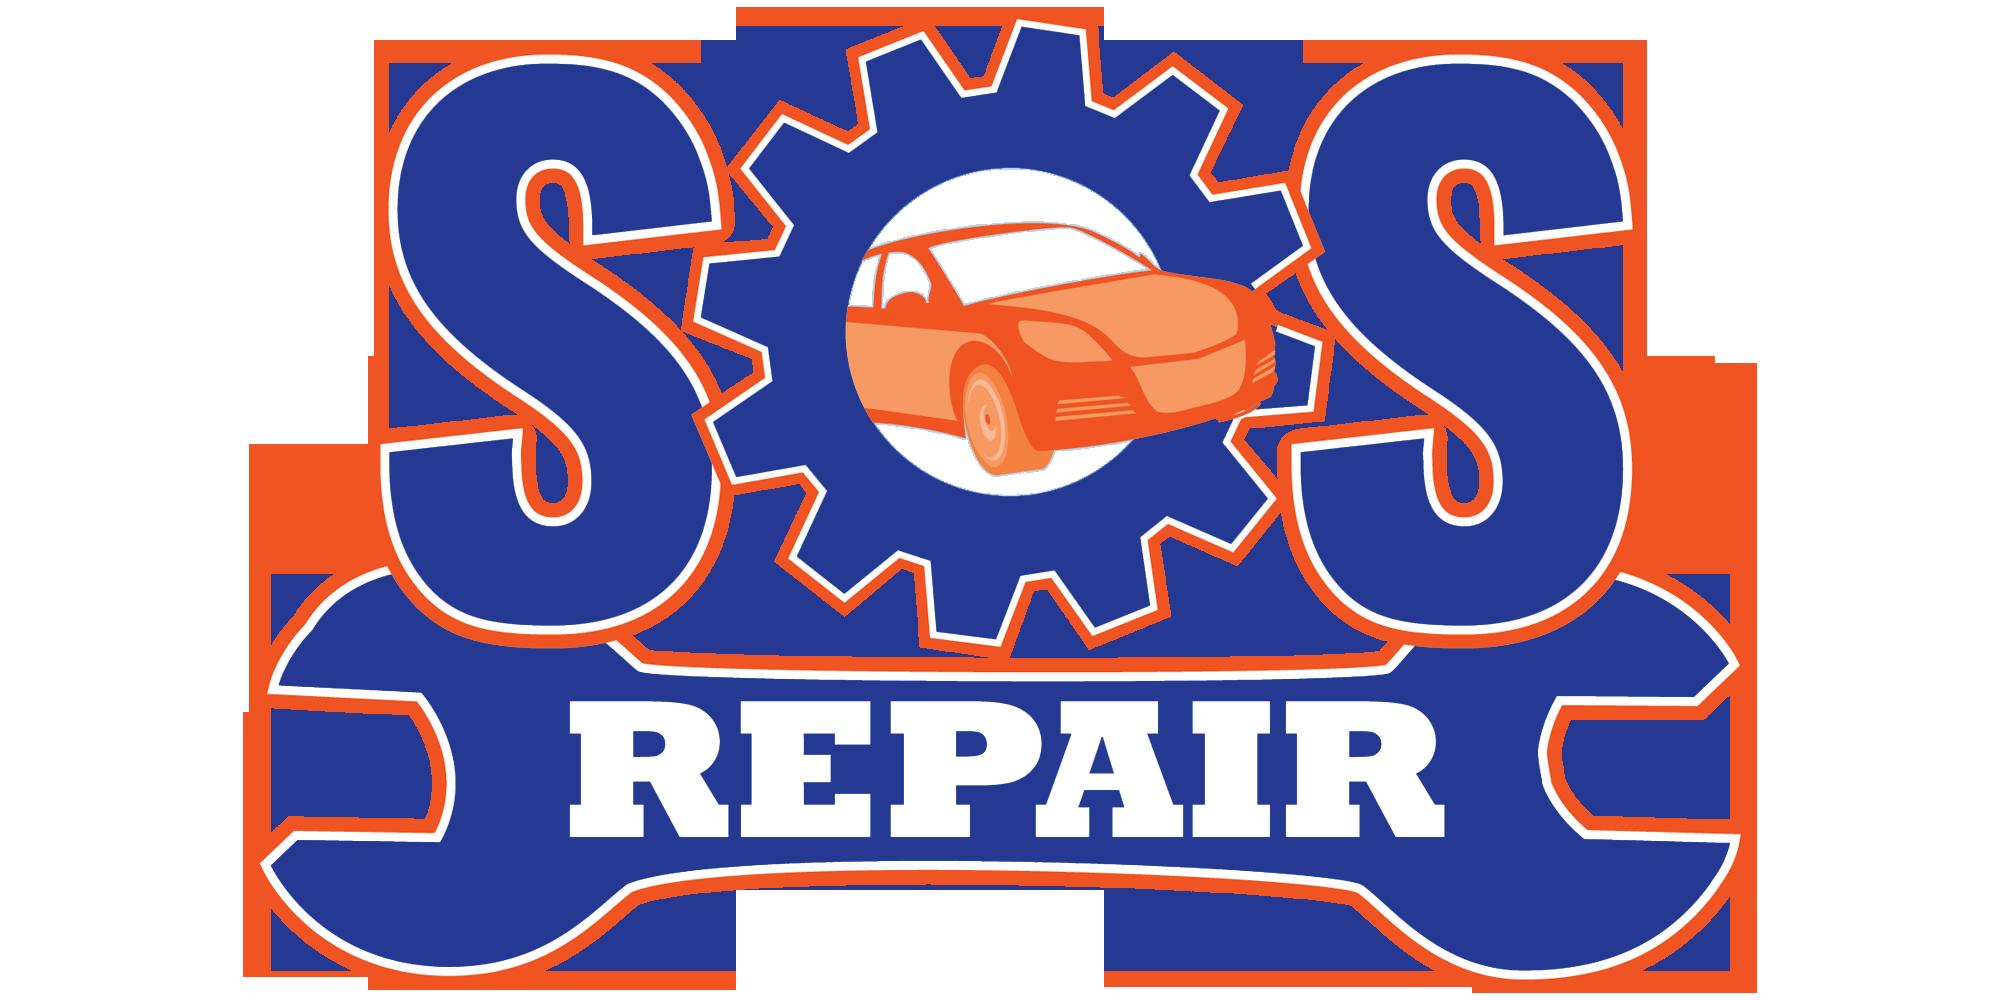 Car repair garage clipart svg royalty free download SOS REPAIR, INC svg royalty free download